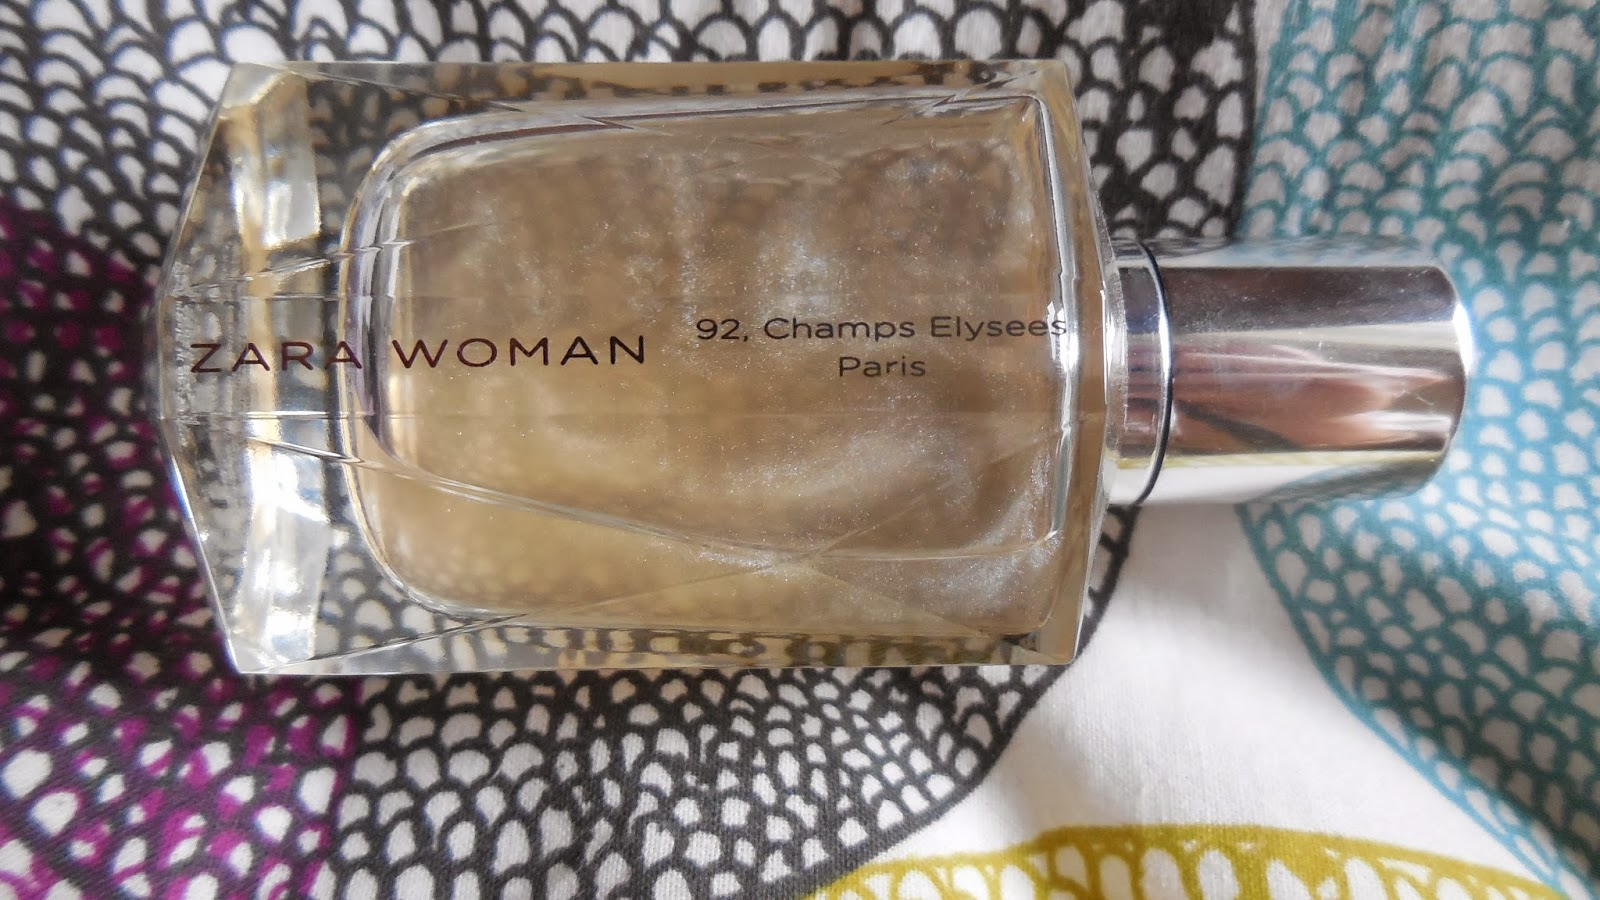 emilia grace love zara champs elysees perfume. Black Bedroom Furniture Sets. Home Design Ideas